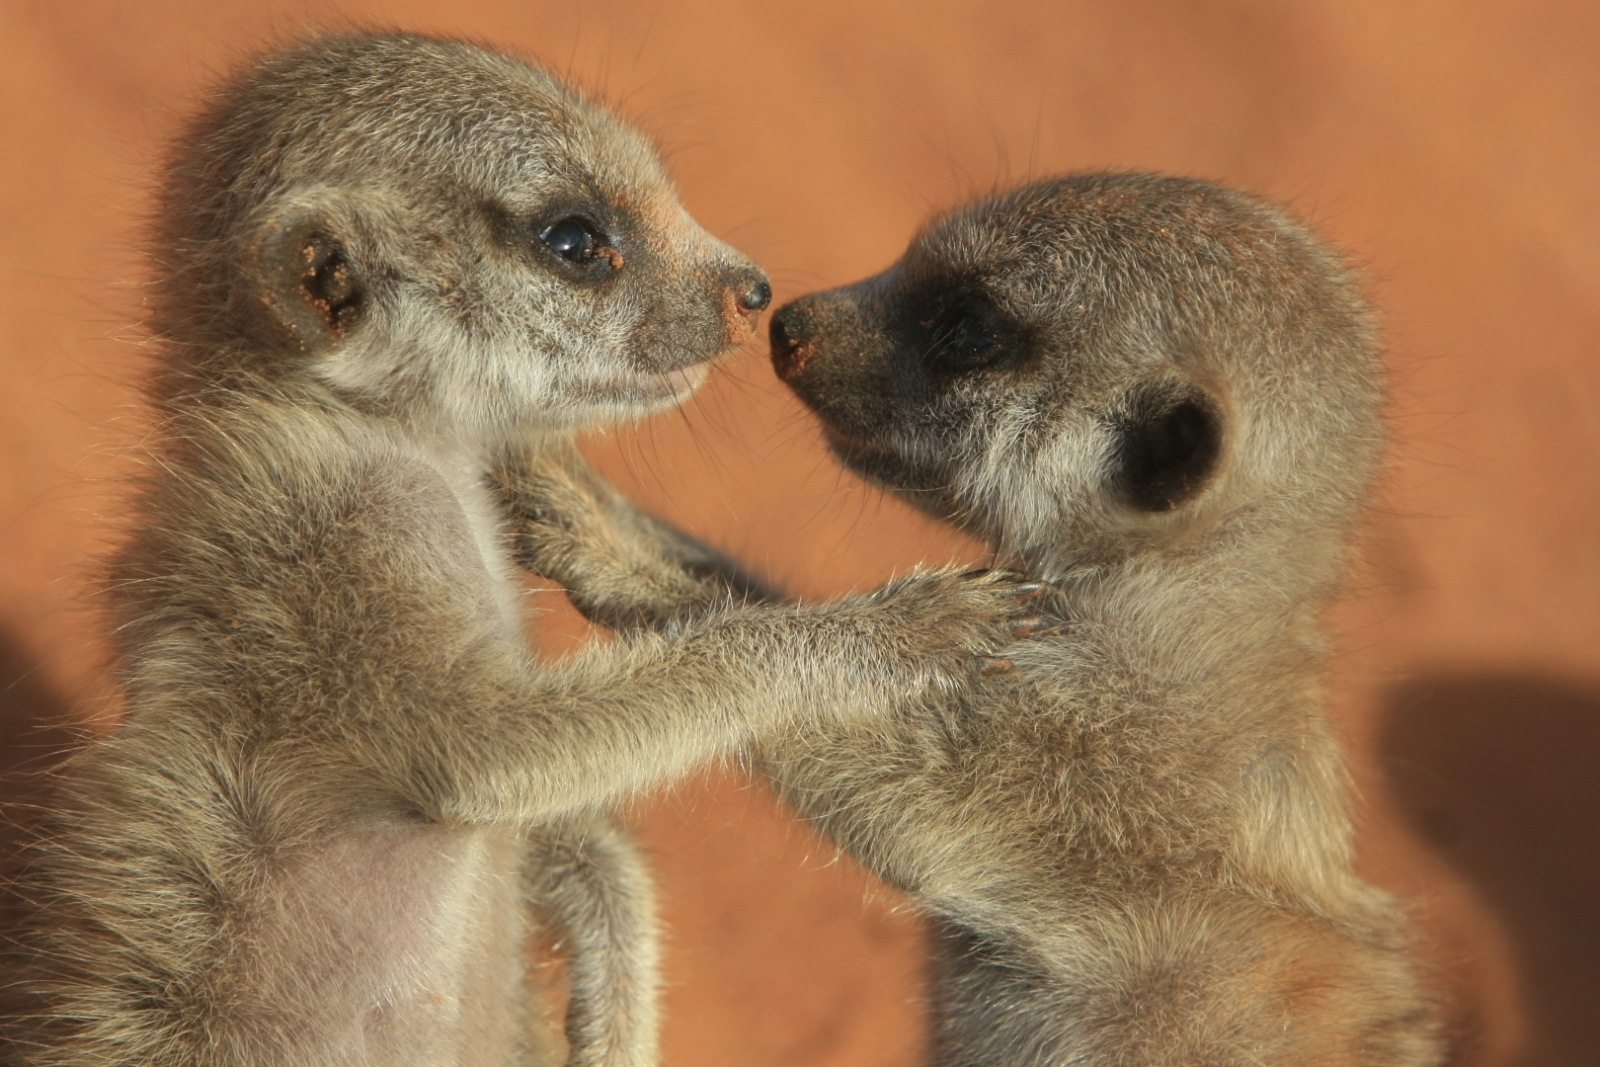 meerkat reproduction strategy